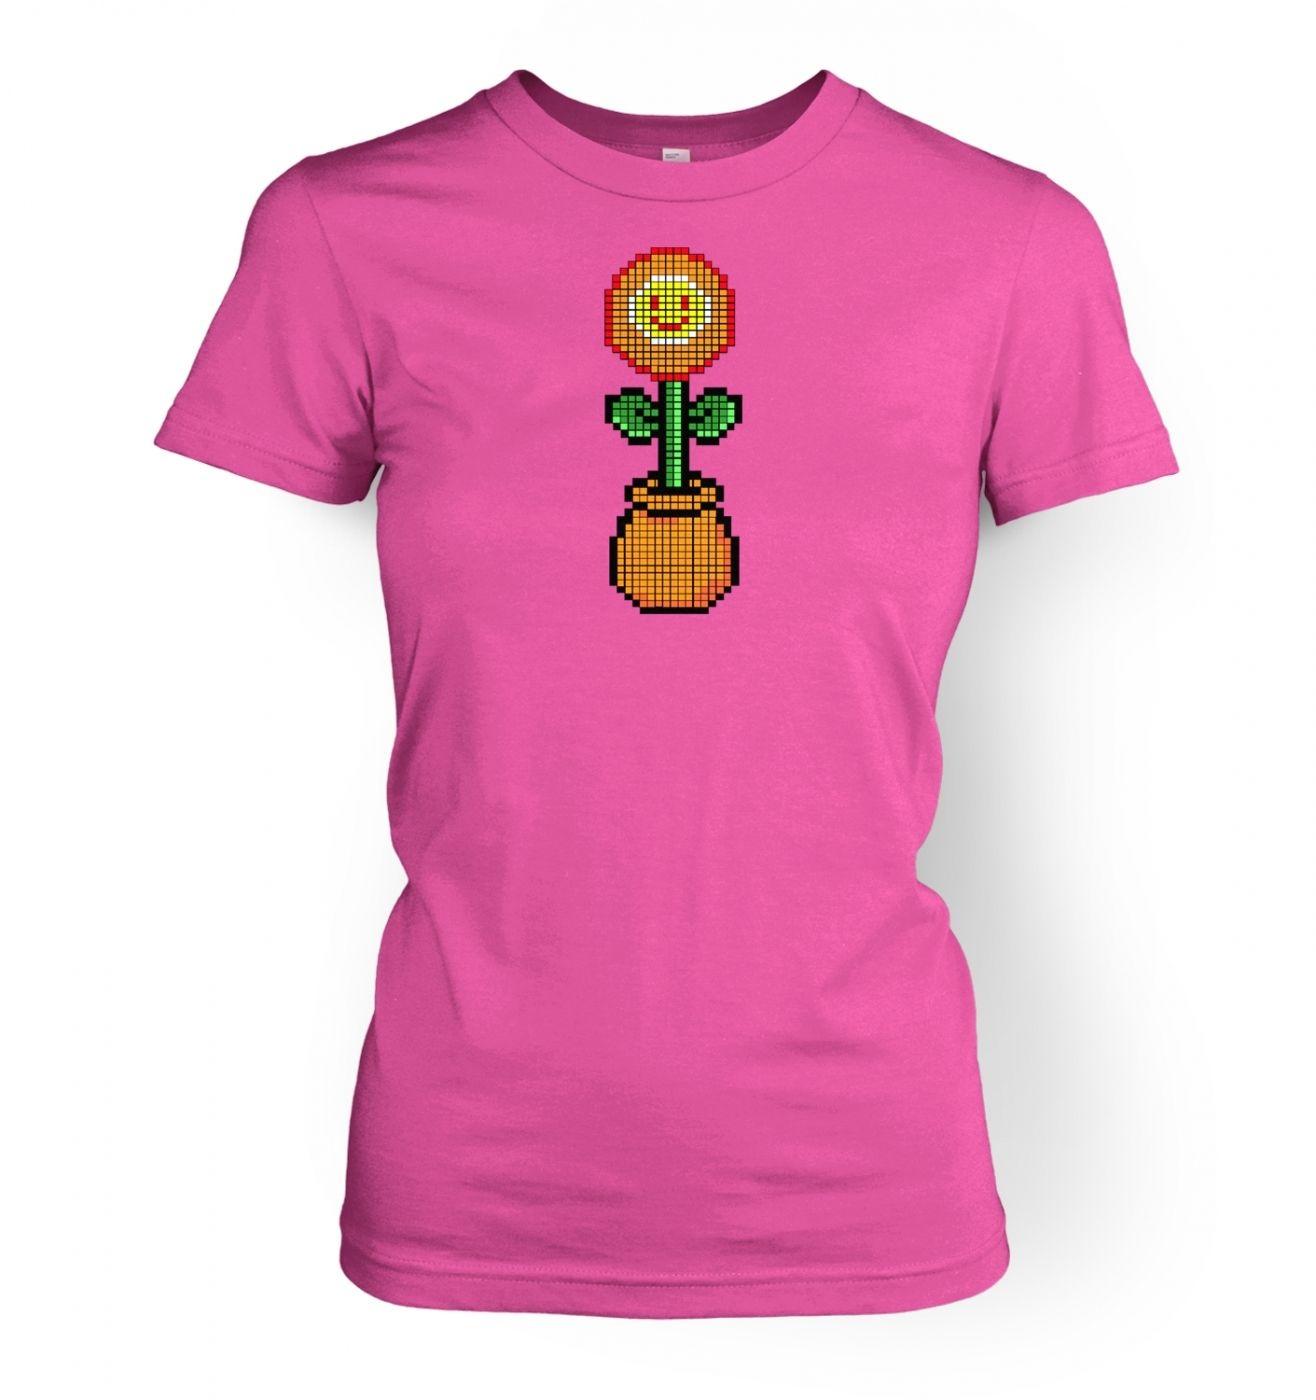 Red 8-Bit flower women's fitted t-shirt